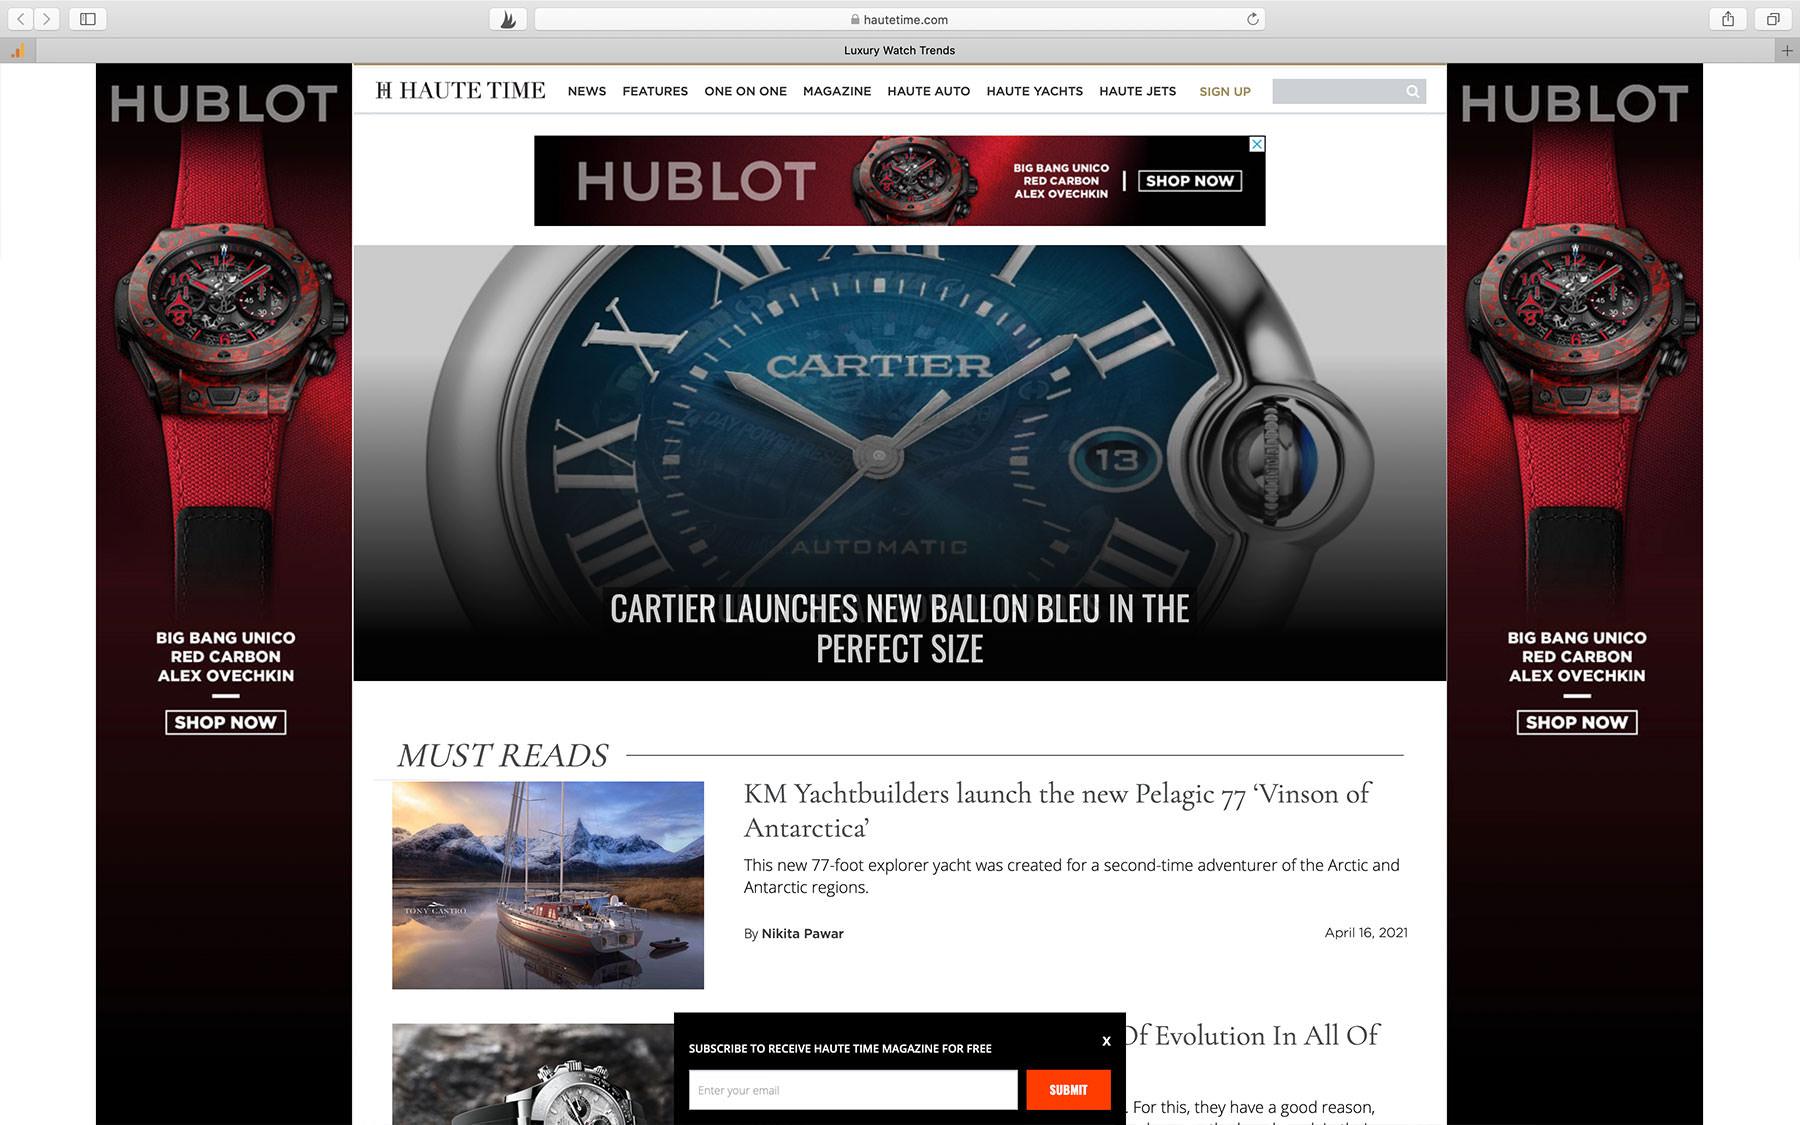 Watch Blogs Haute Time